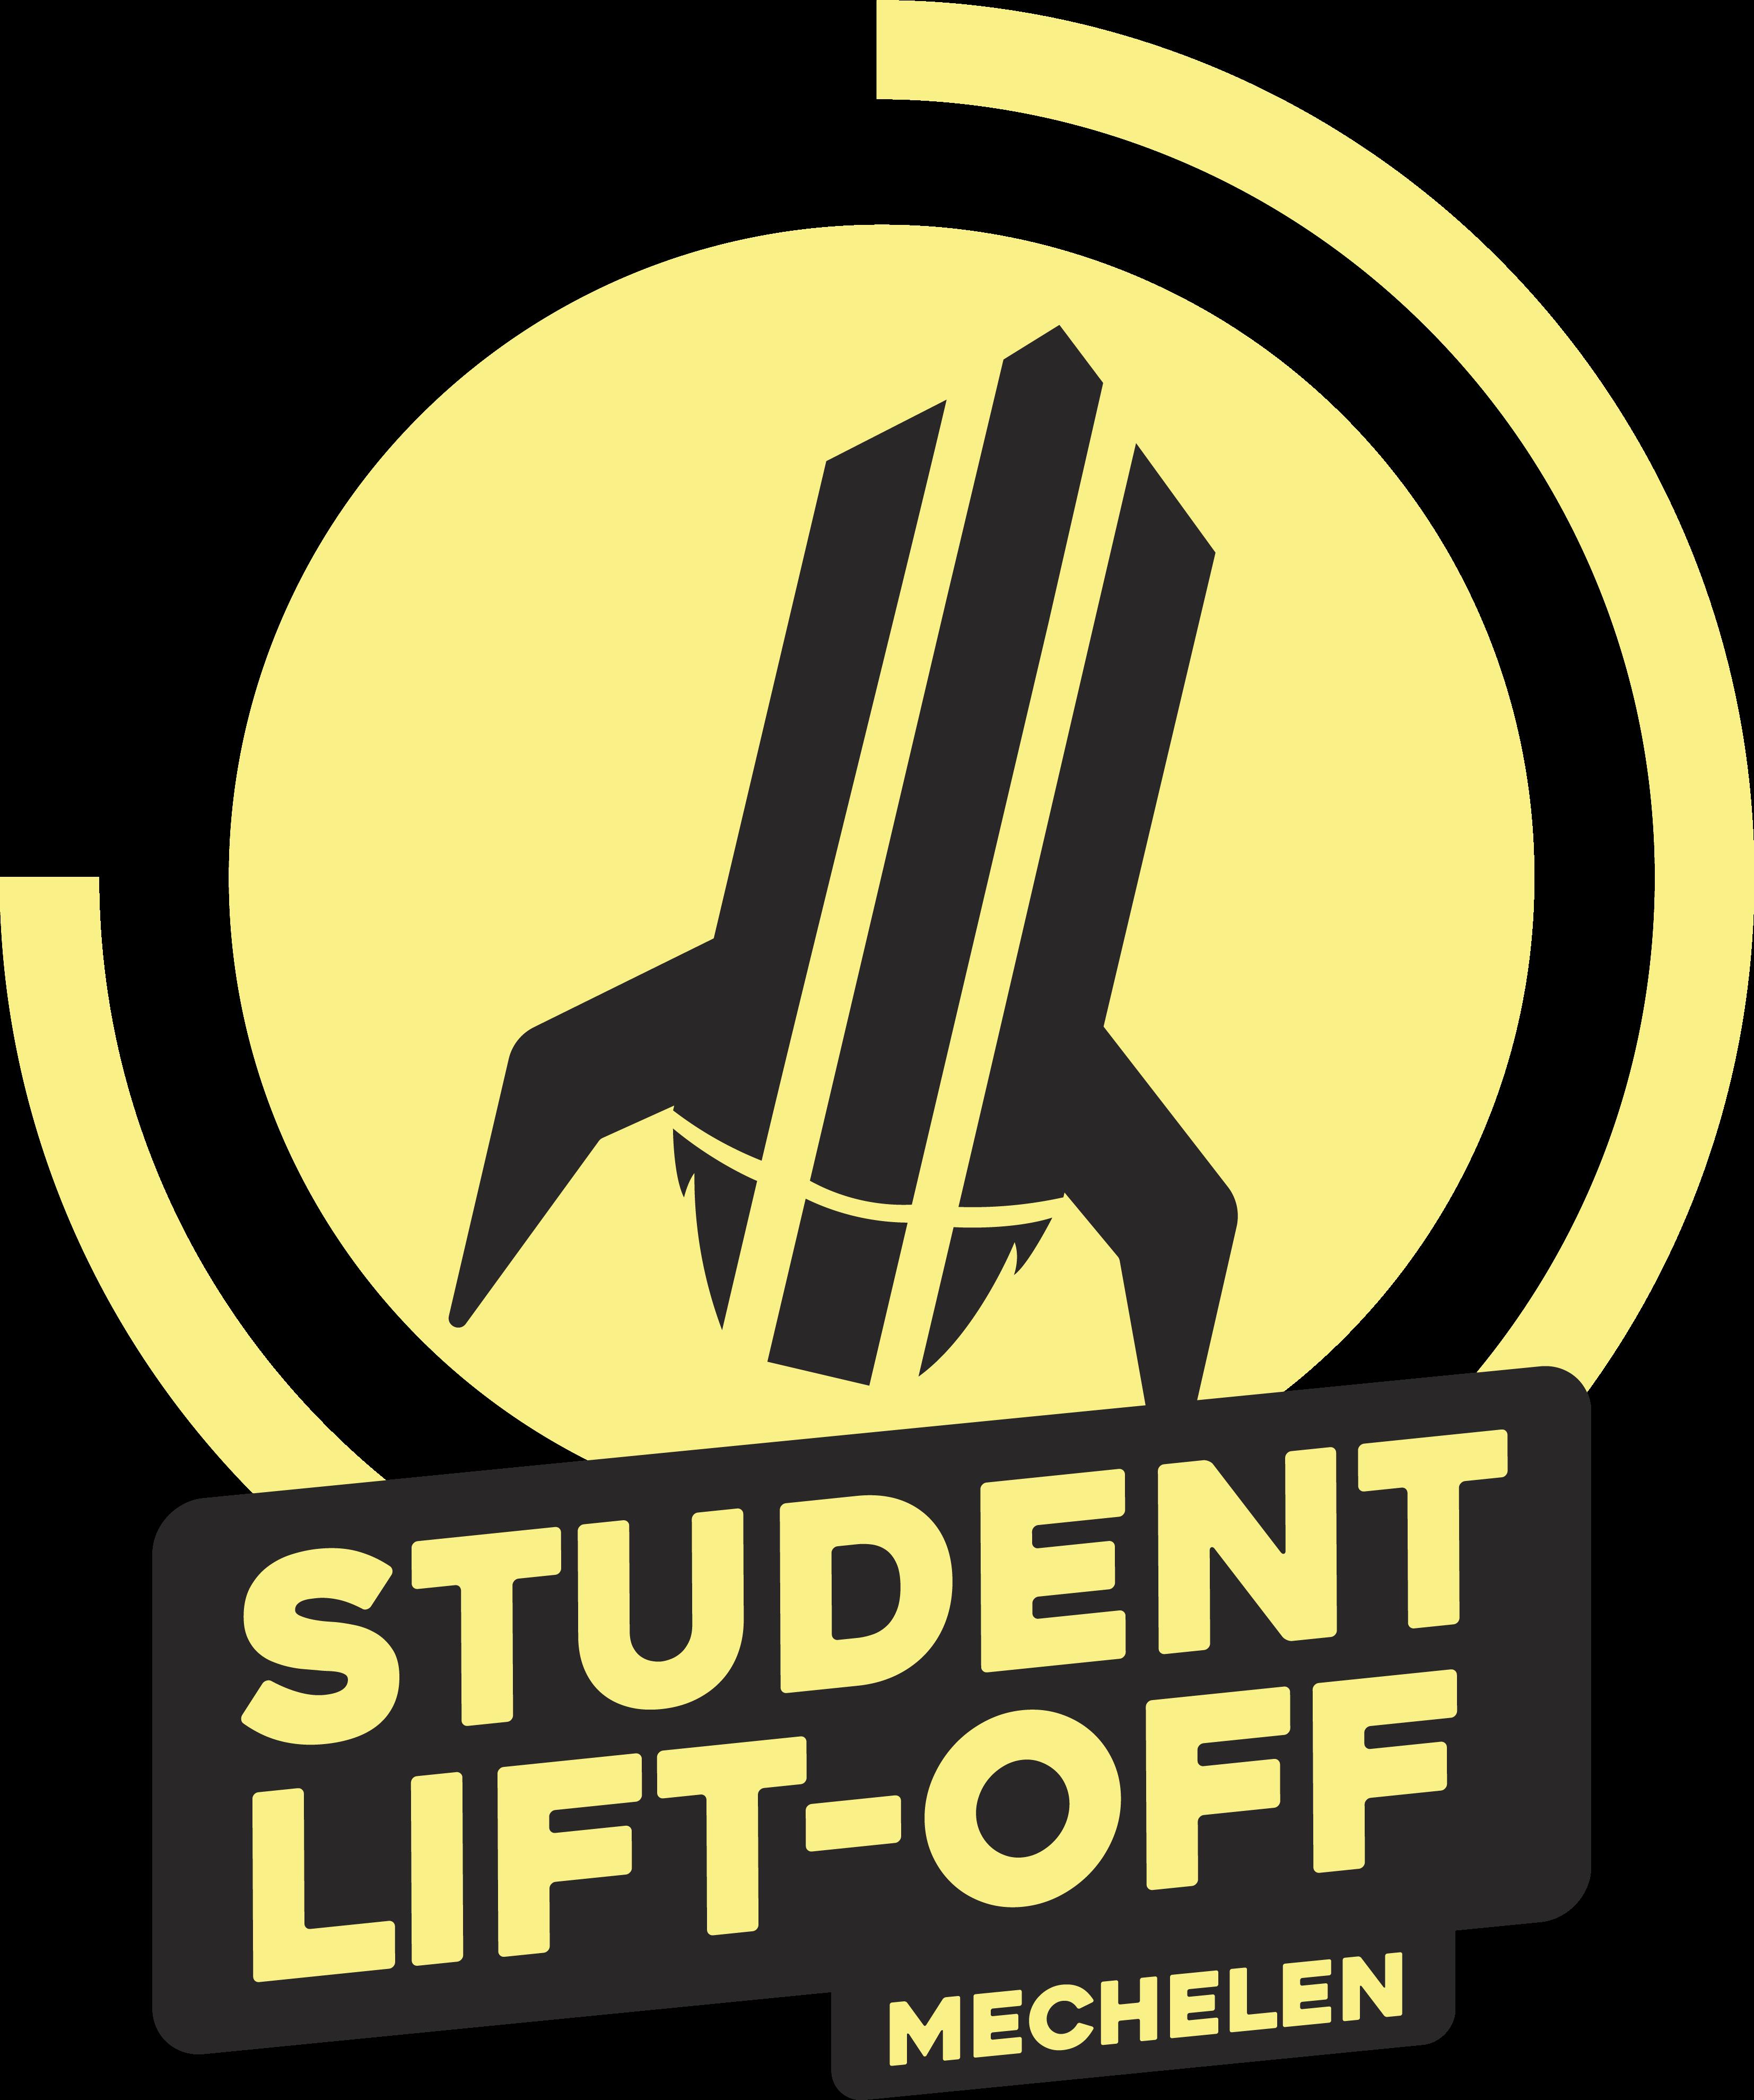 Student Lift-Off